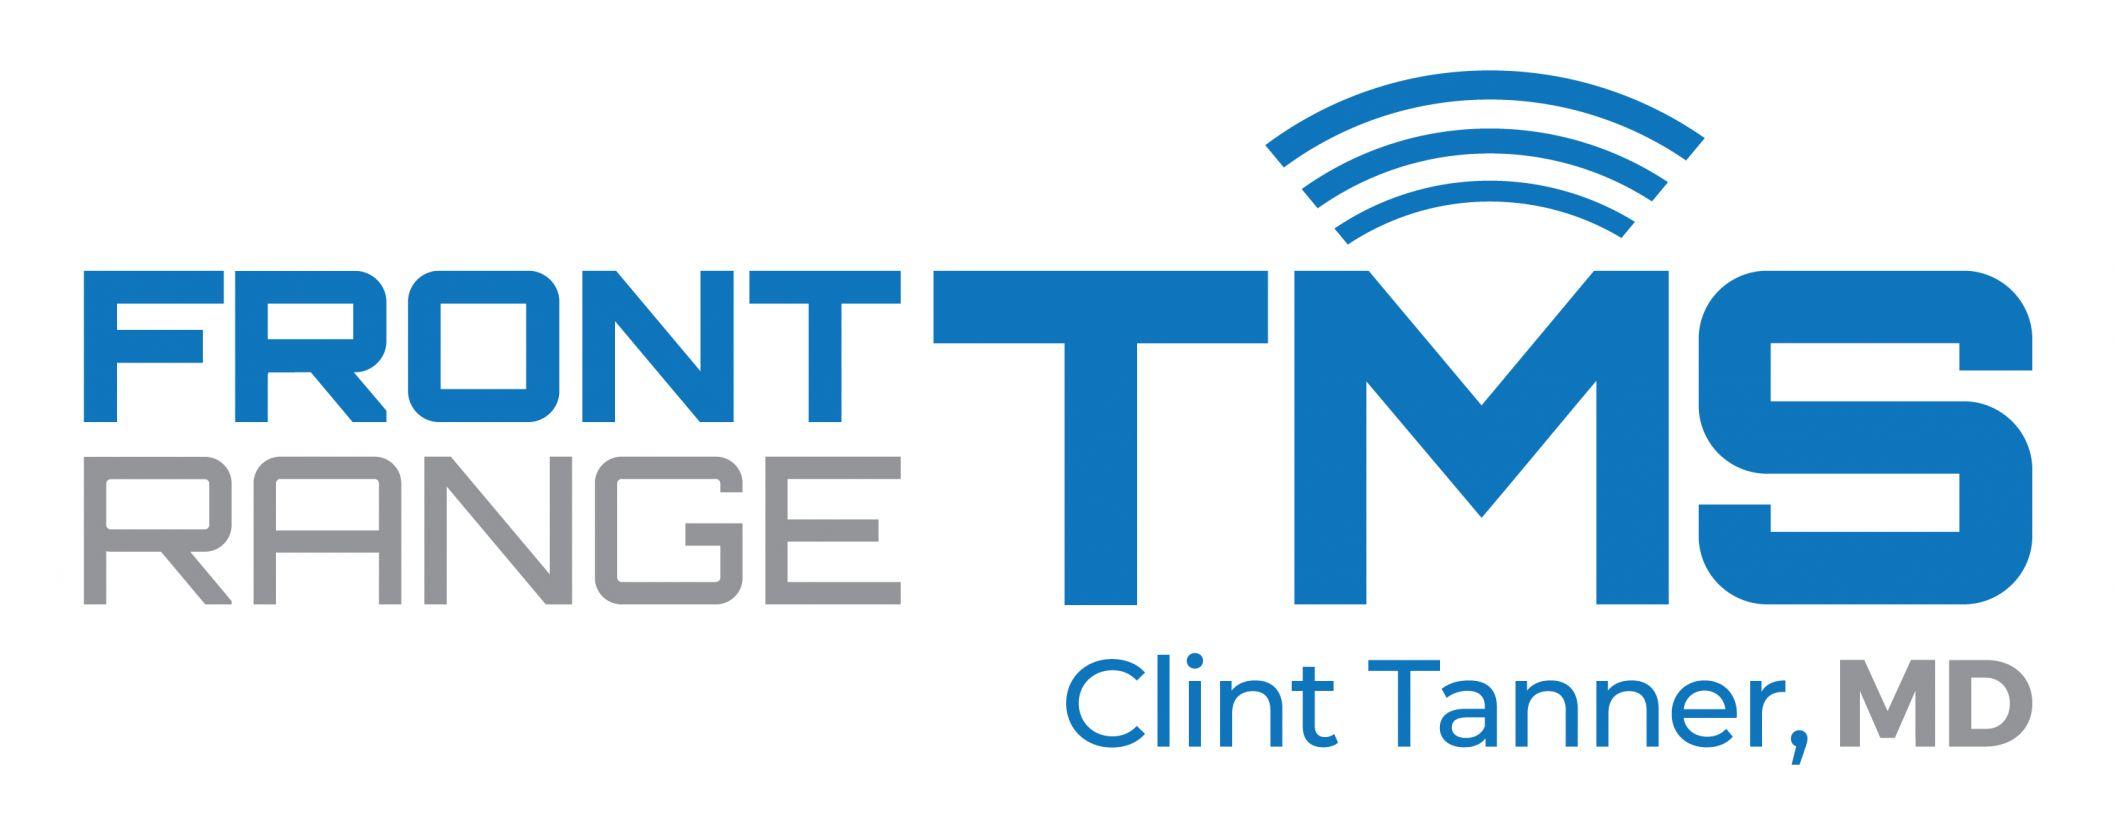 Front Range TMS Logo